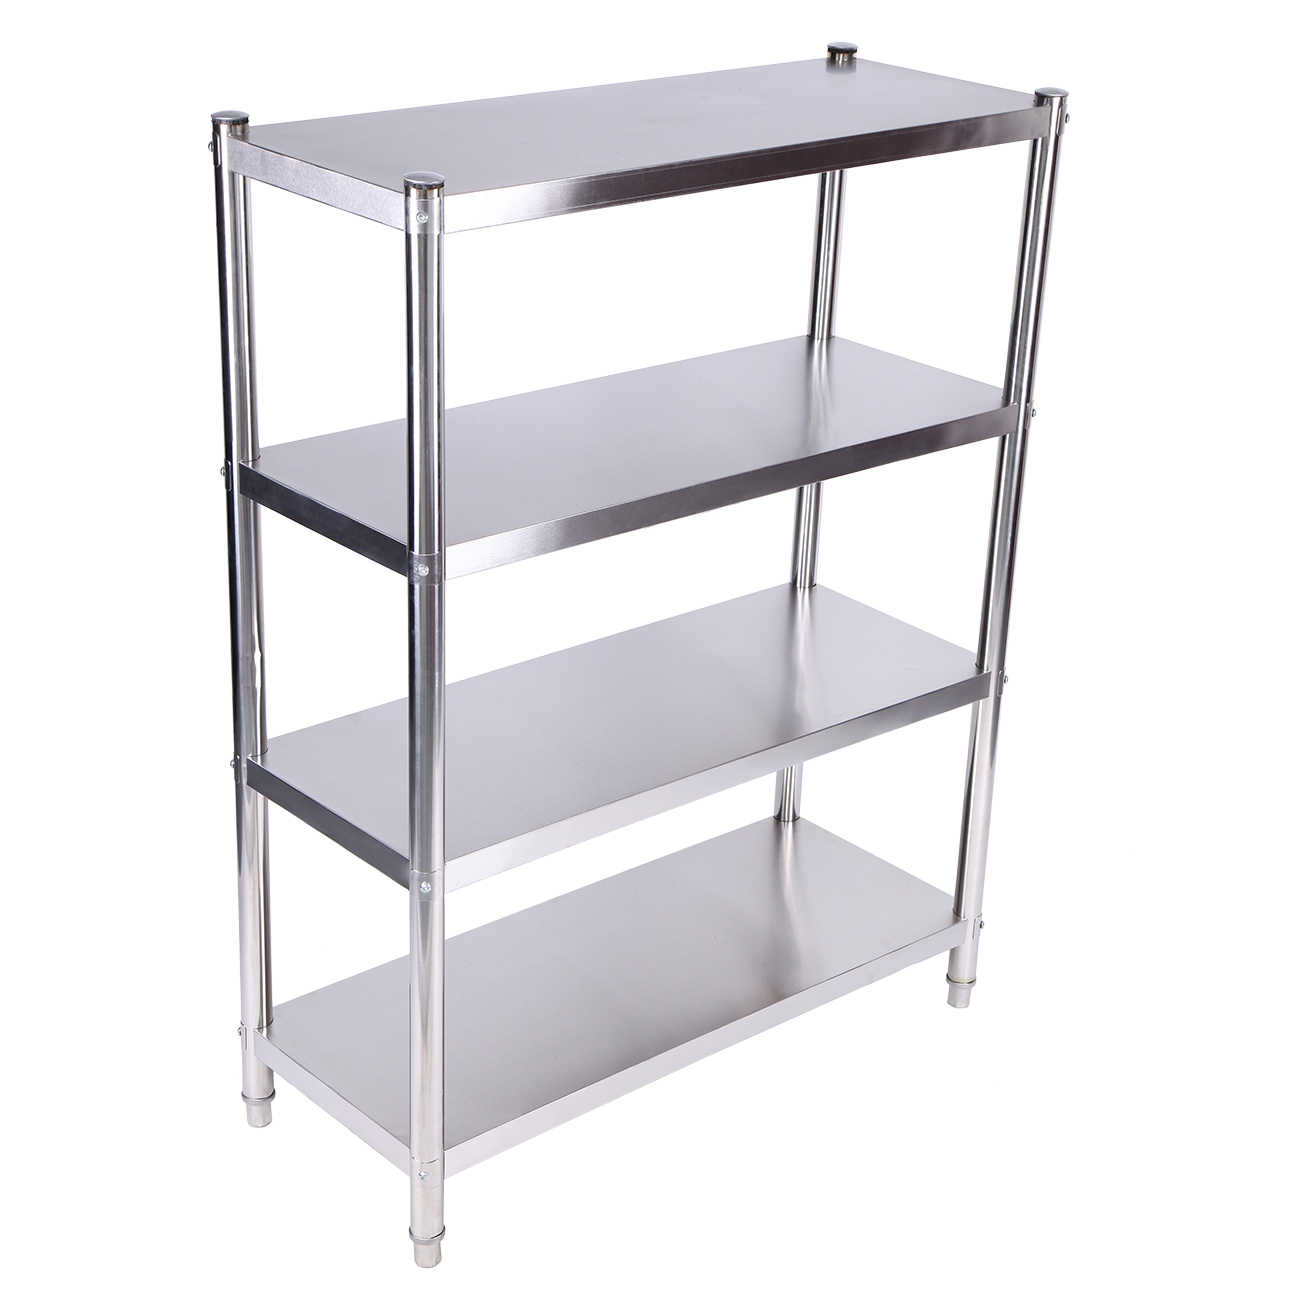 Yonntech 4 Tier Storage Rack Shelf Stainless Steel Commercial Kitchen Kitchen Islands Trolleys Aliexpress